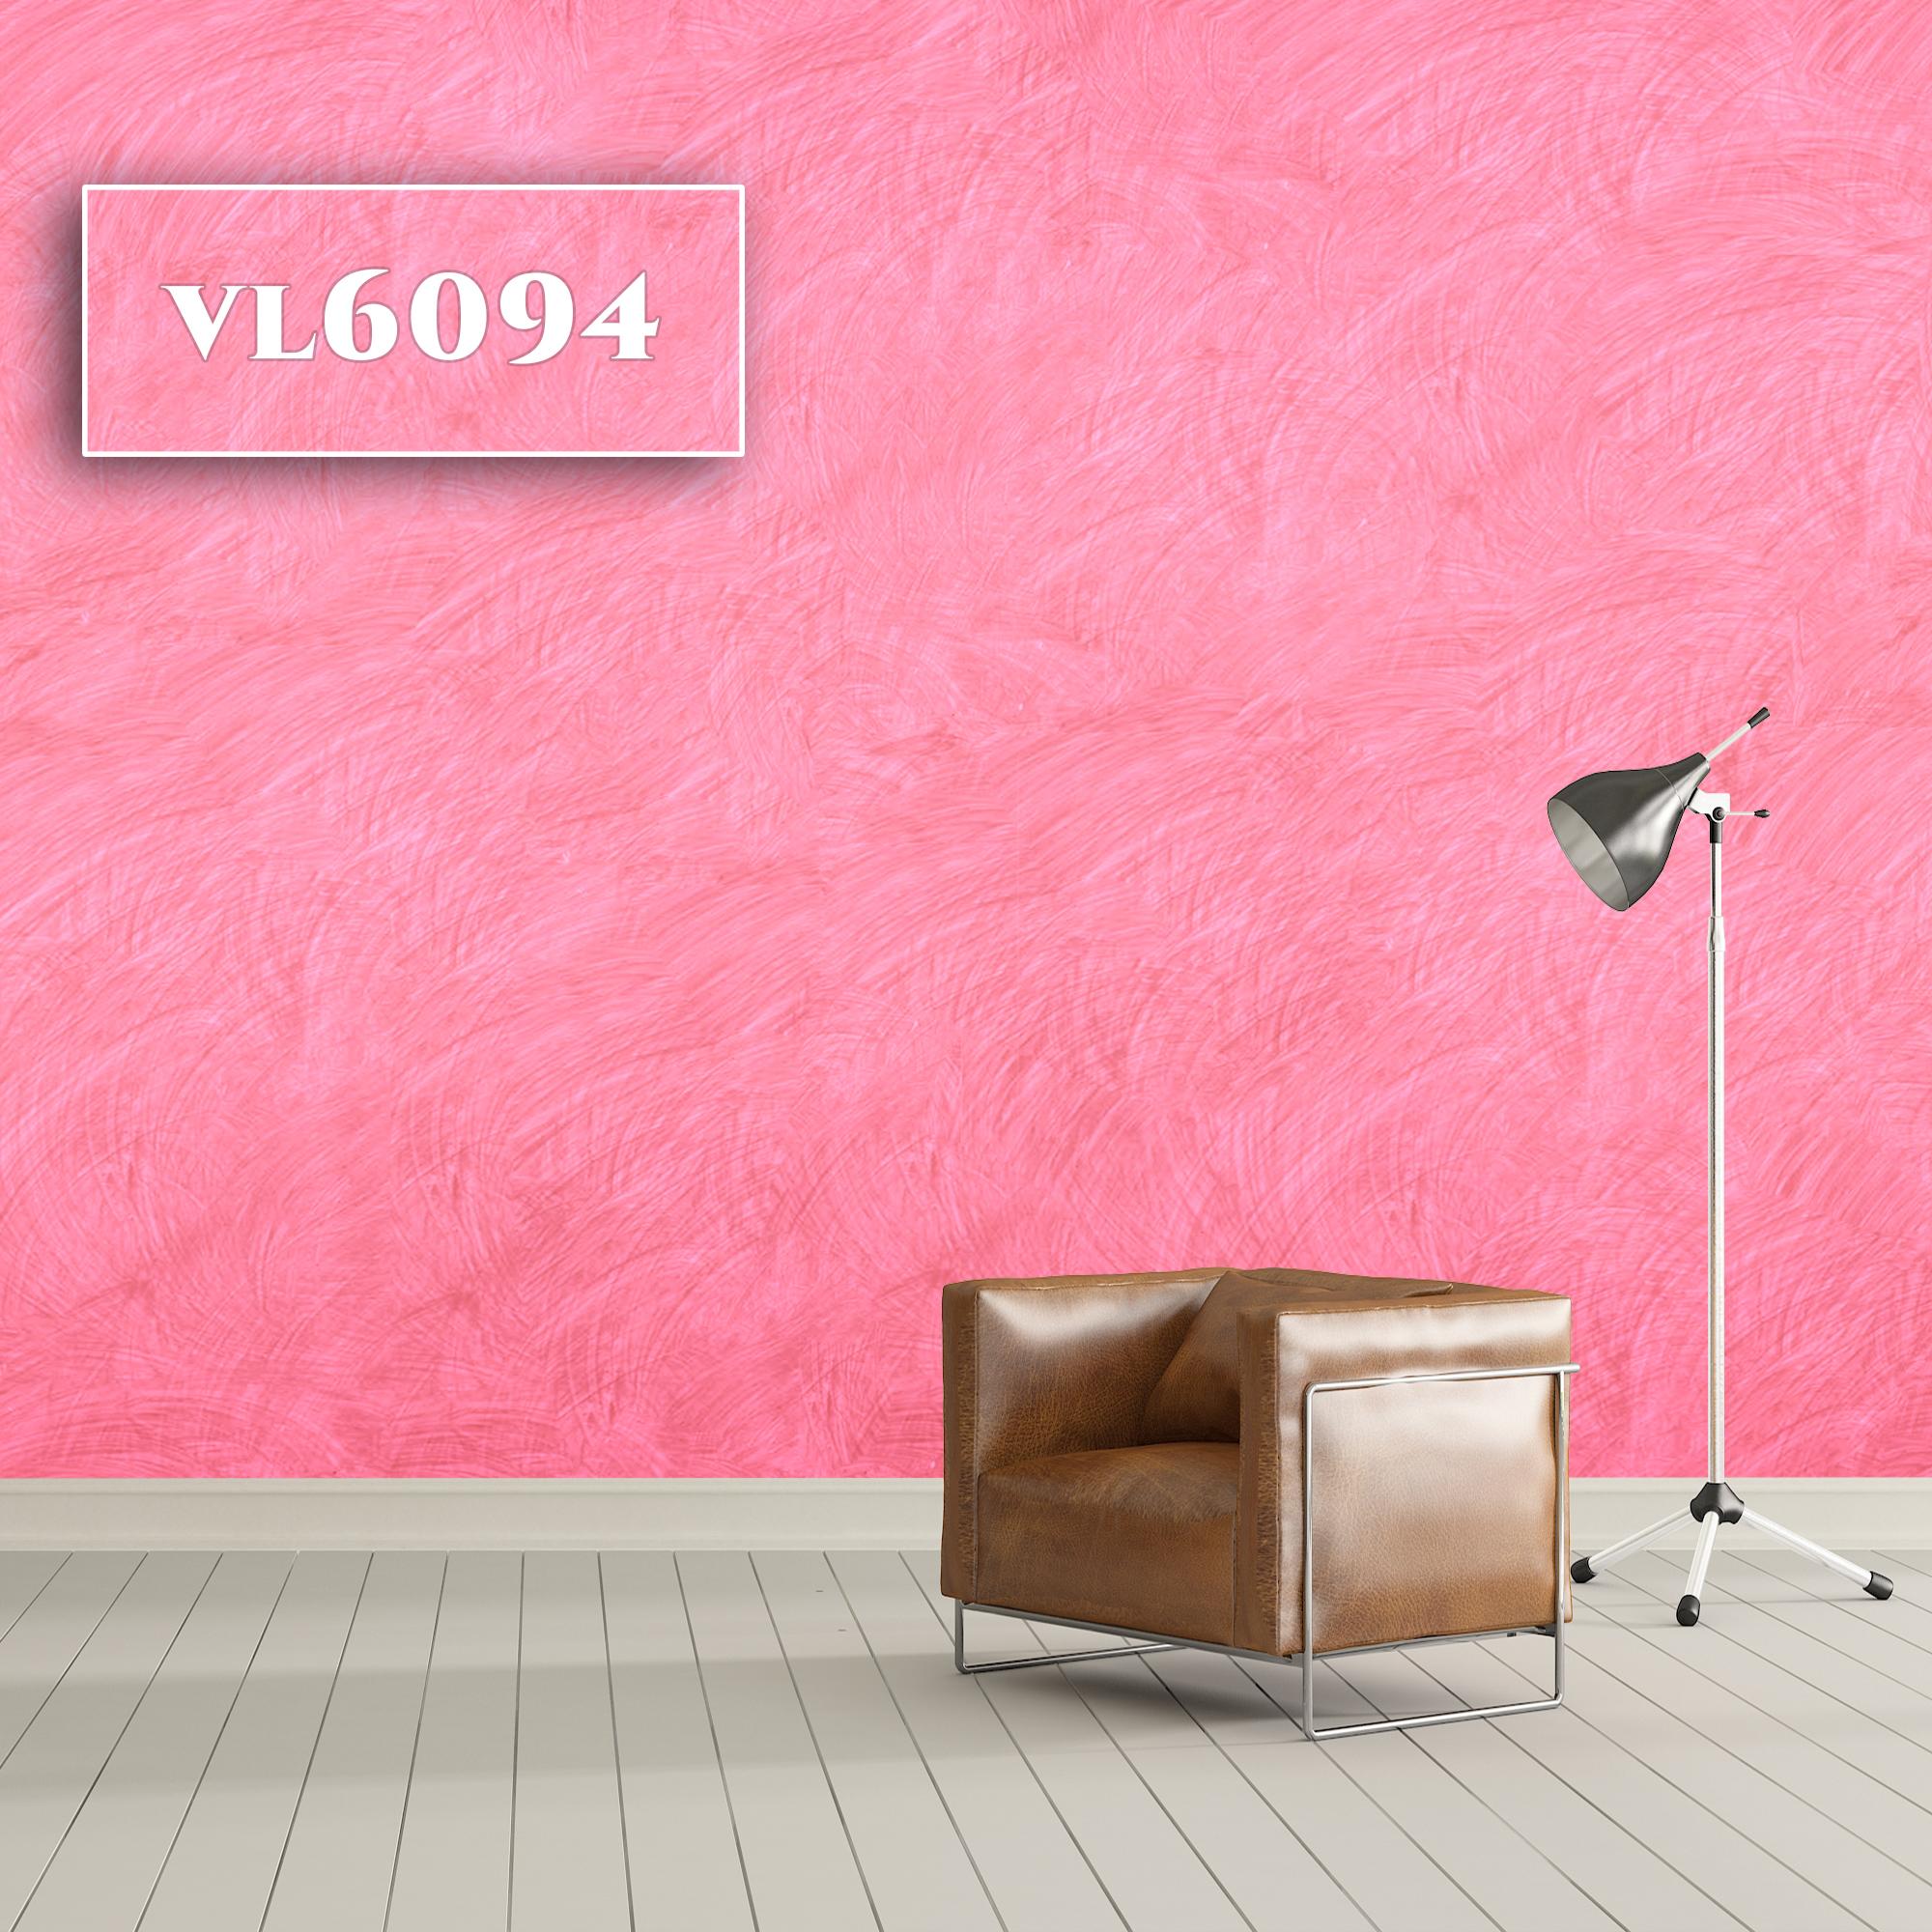 VL6094